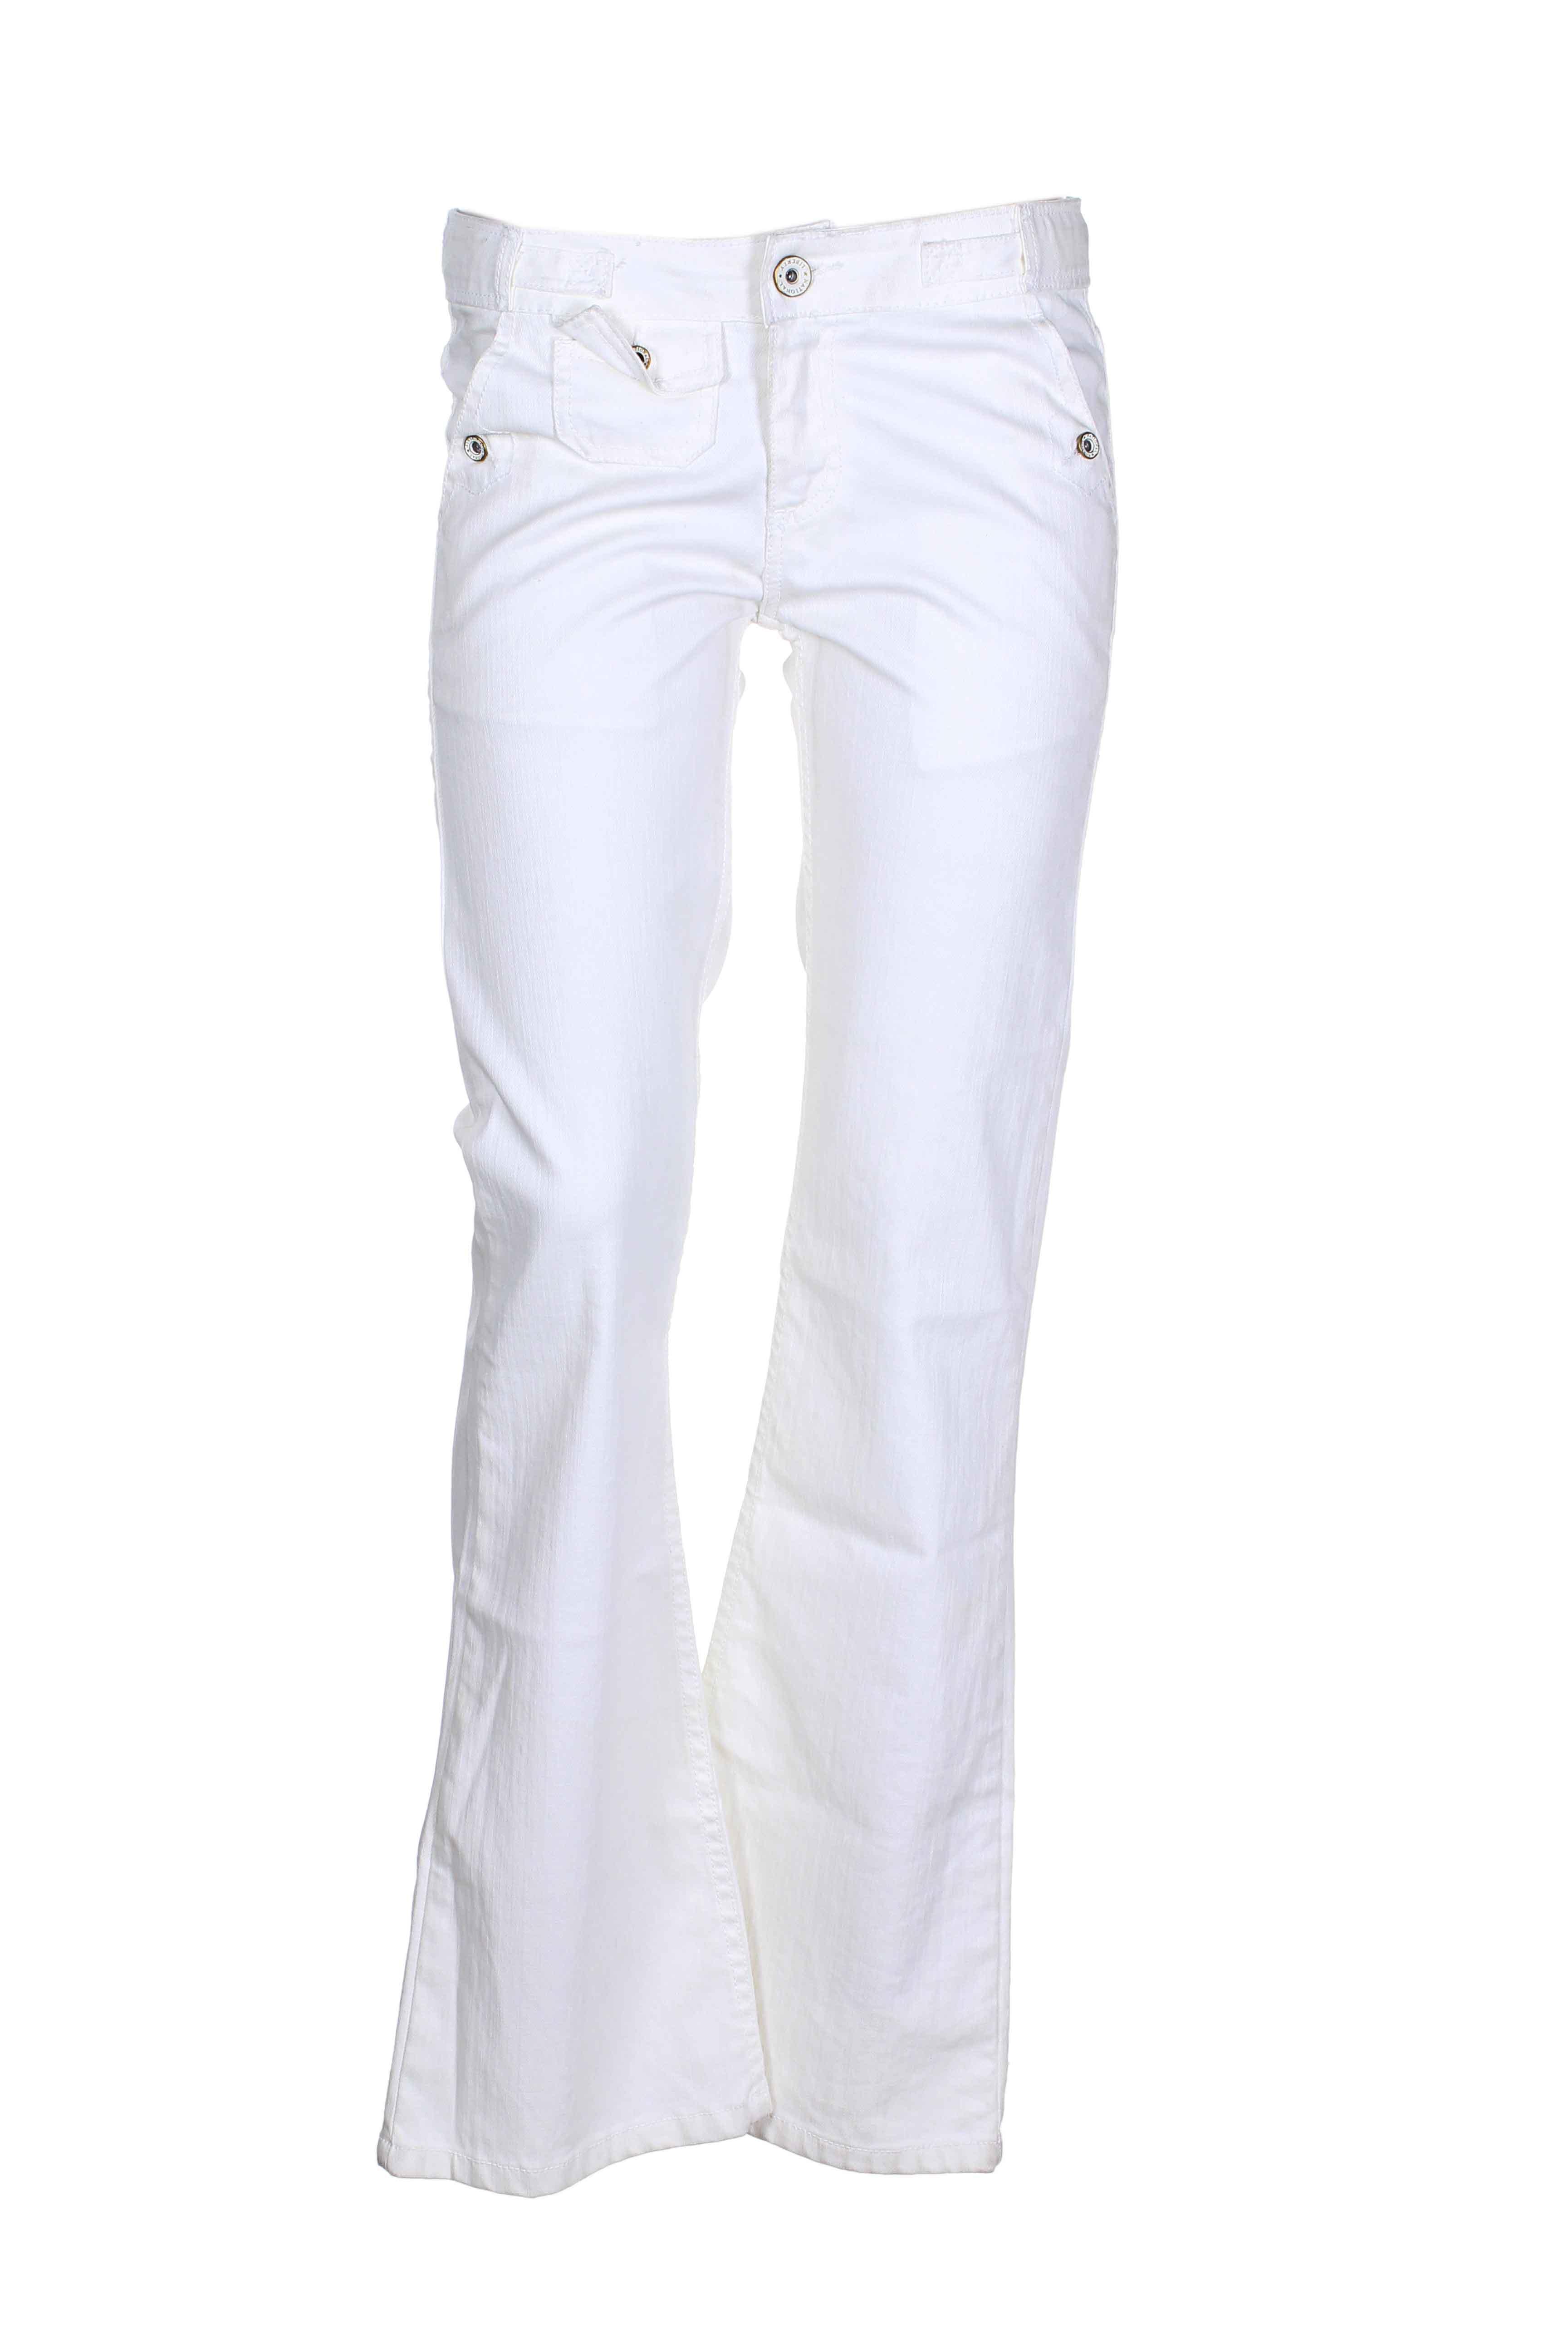 Pantalon casual femme National Liberty beige taille : 40 9 FR (FR)